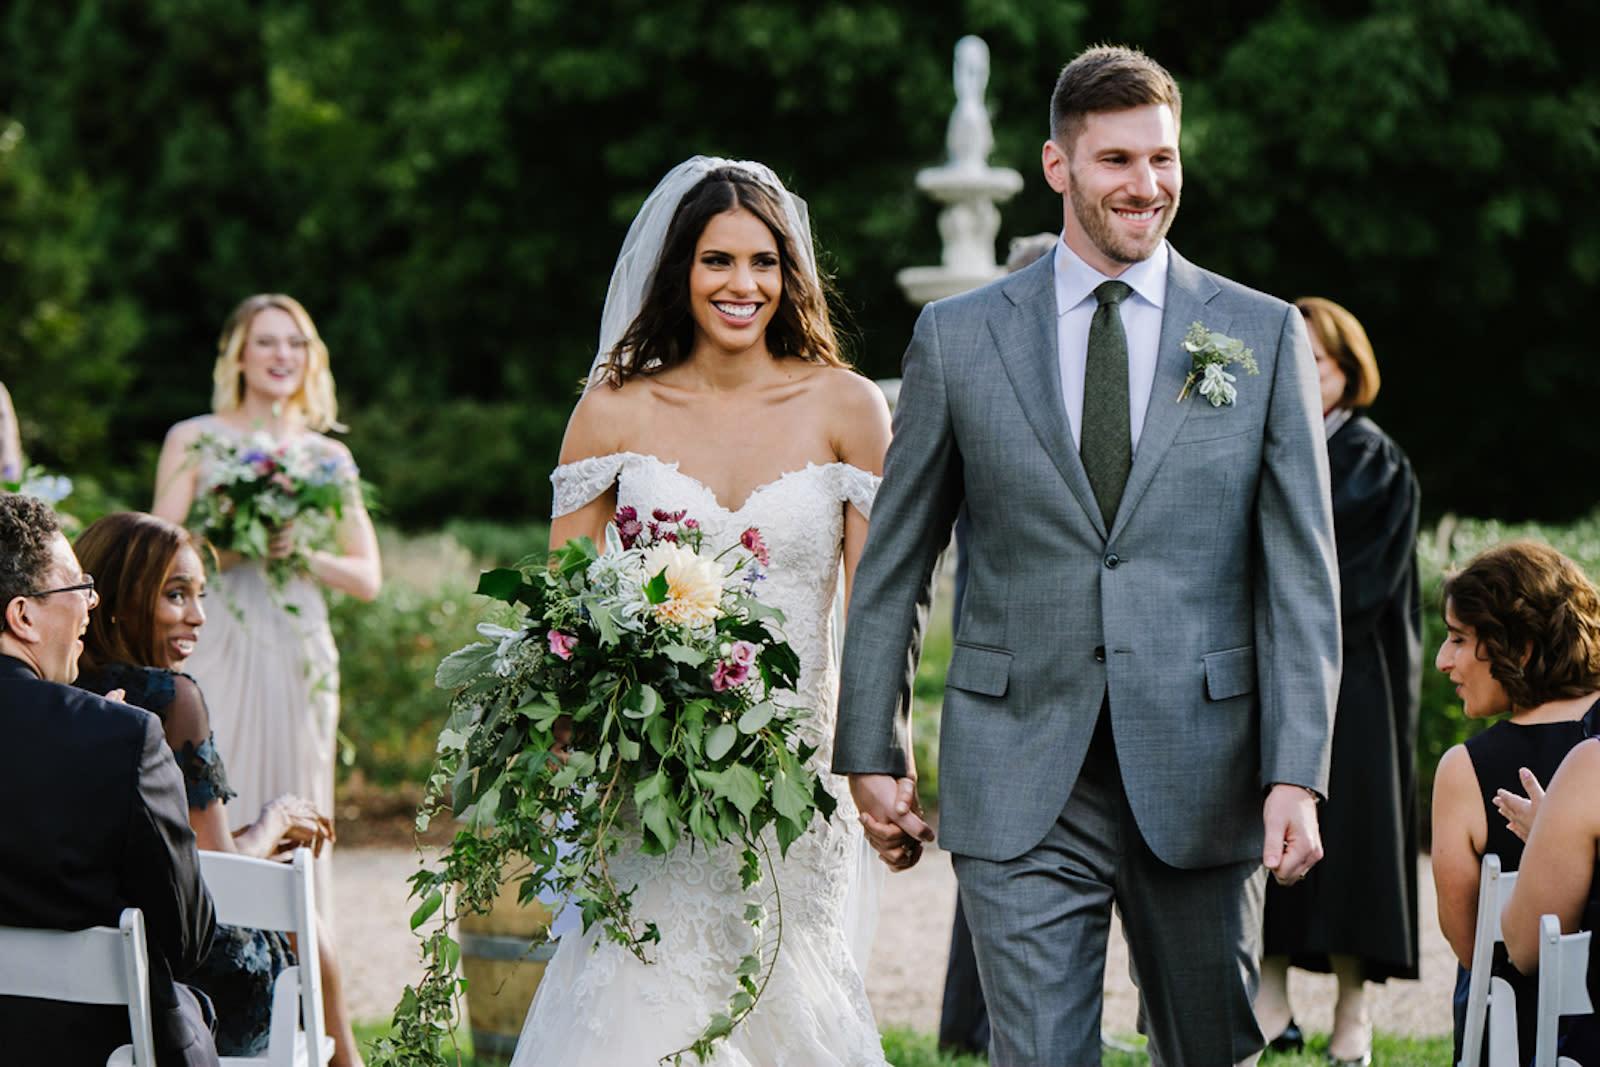 Upbeat Wedding Recessional Songs.Top 10 Wedding Recessional Songs Zola Expert Wedding Advice